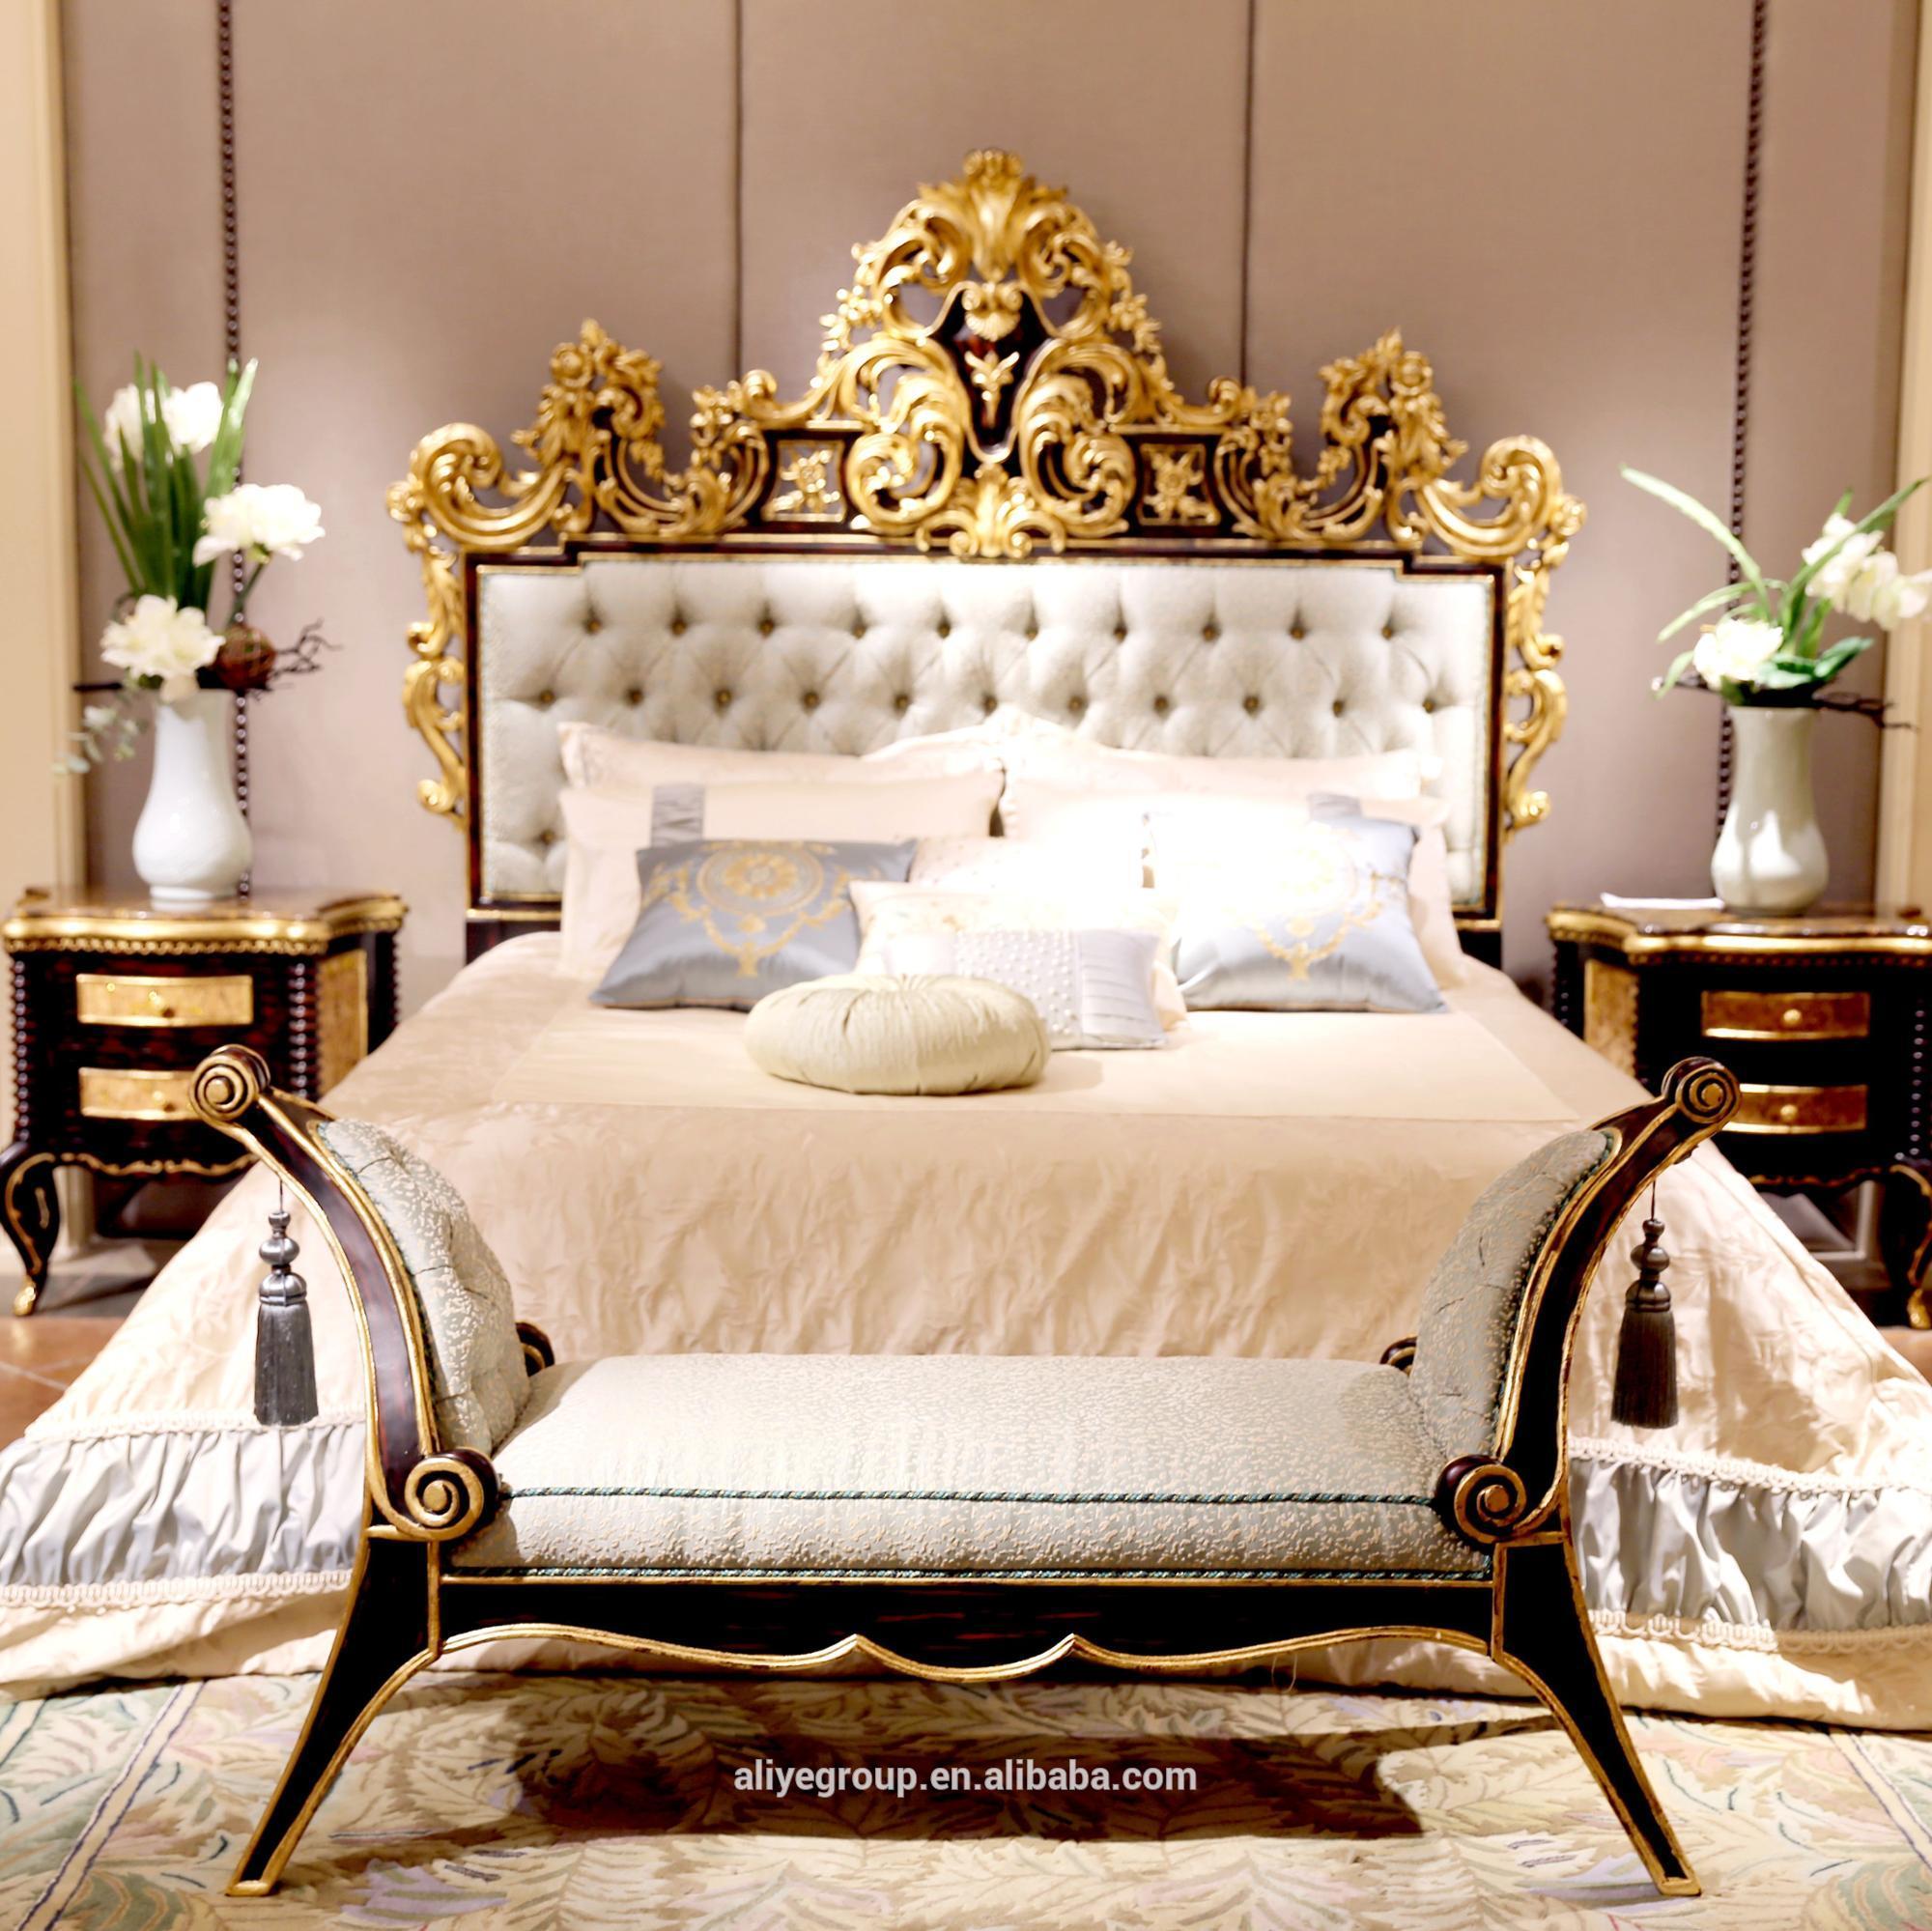 Full Size of Kingsize Bett Afb07 Foshan Klassische Luxus Antike Betten Mit Beleuchtung Box Spring Tojo V Nussbaum 140x200 Bettkasten Konfigurieren 180x200 Lattenrost Und Bett Kingsize Bett